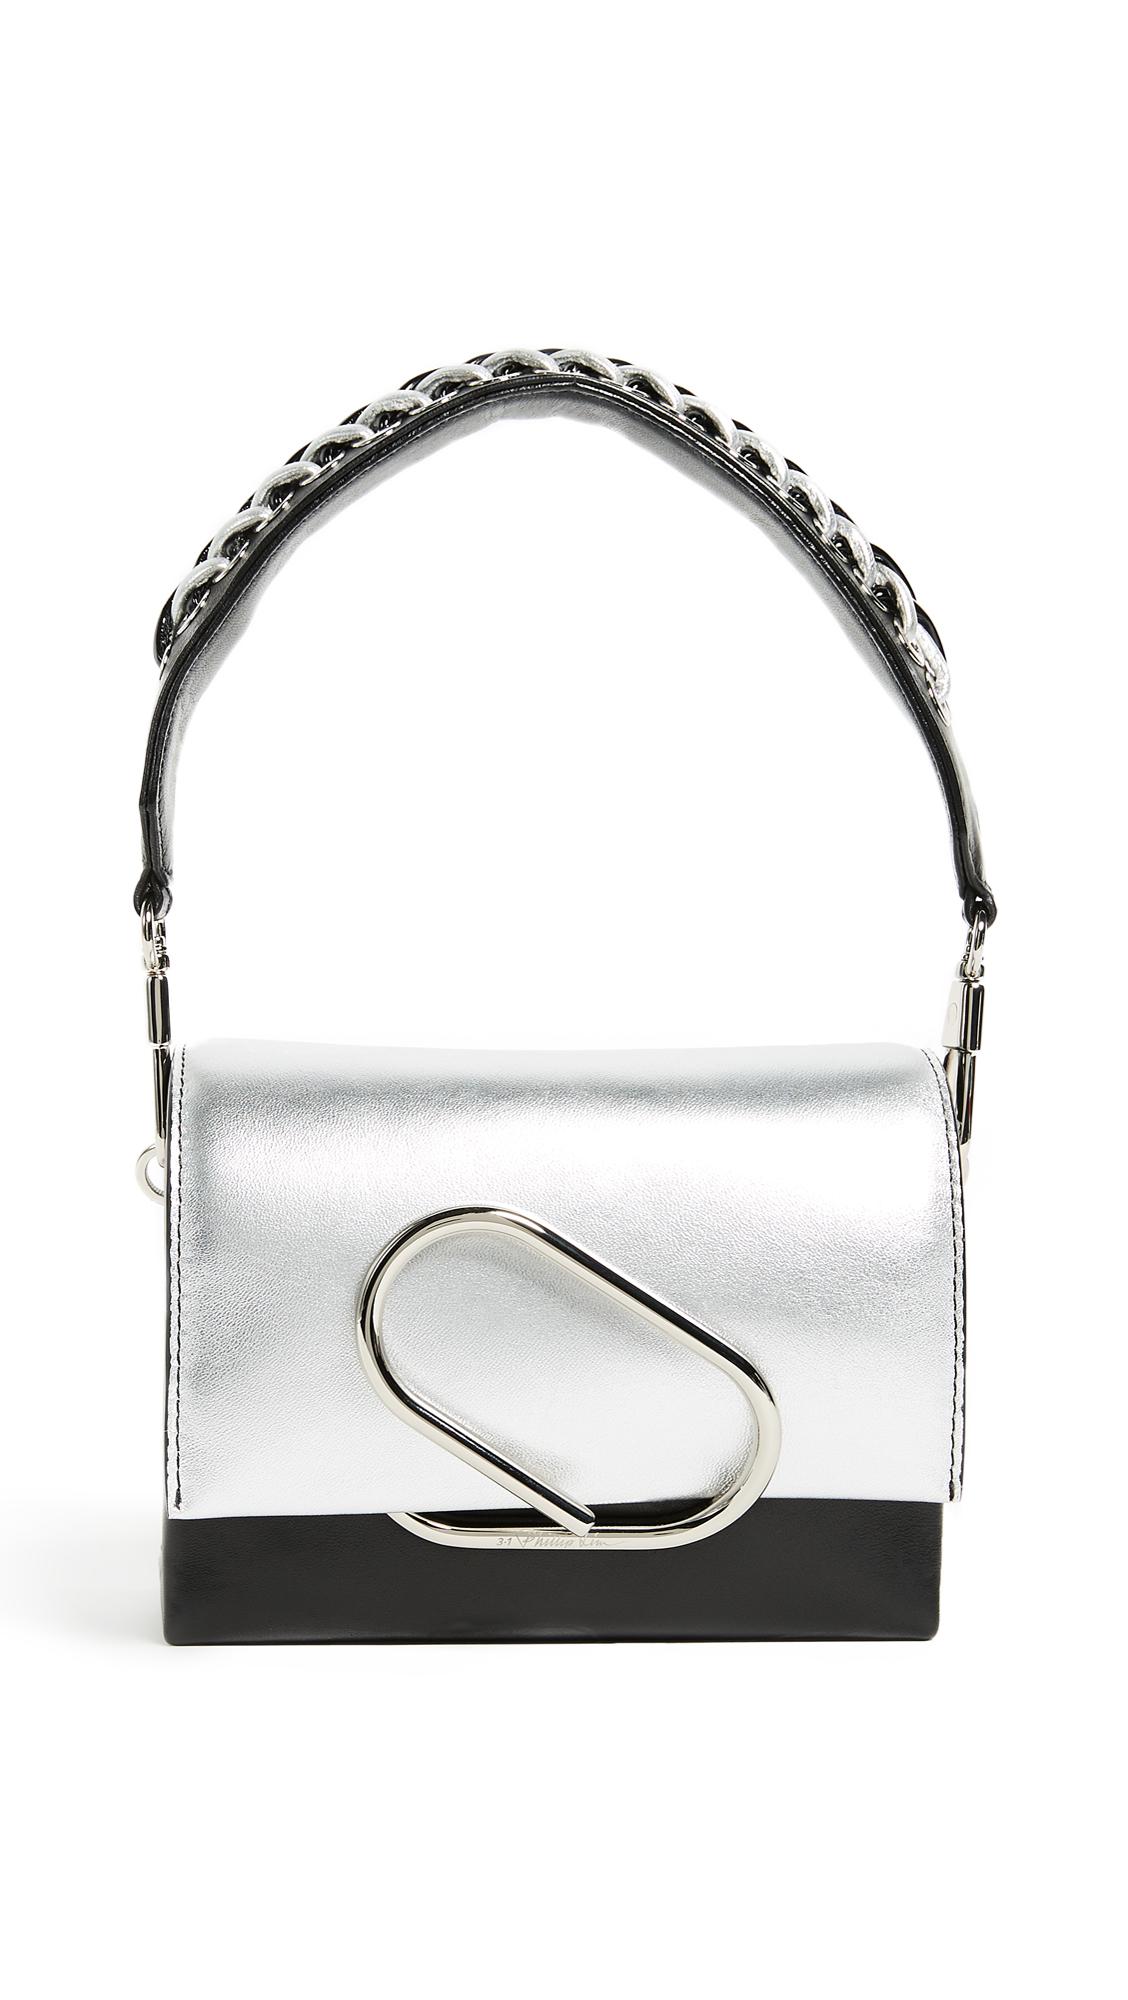 3.1 Phillip Lim Alix Micro Sport Cross Body Bag - Silver/Black